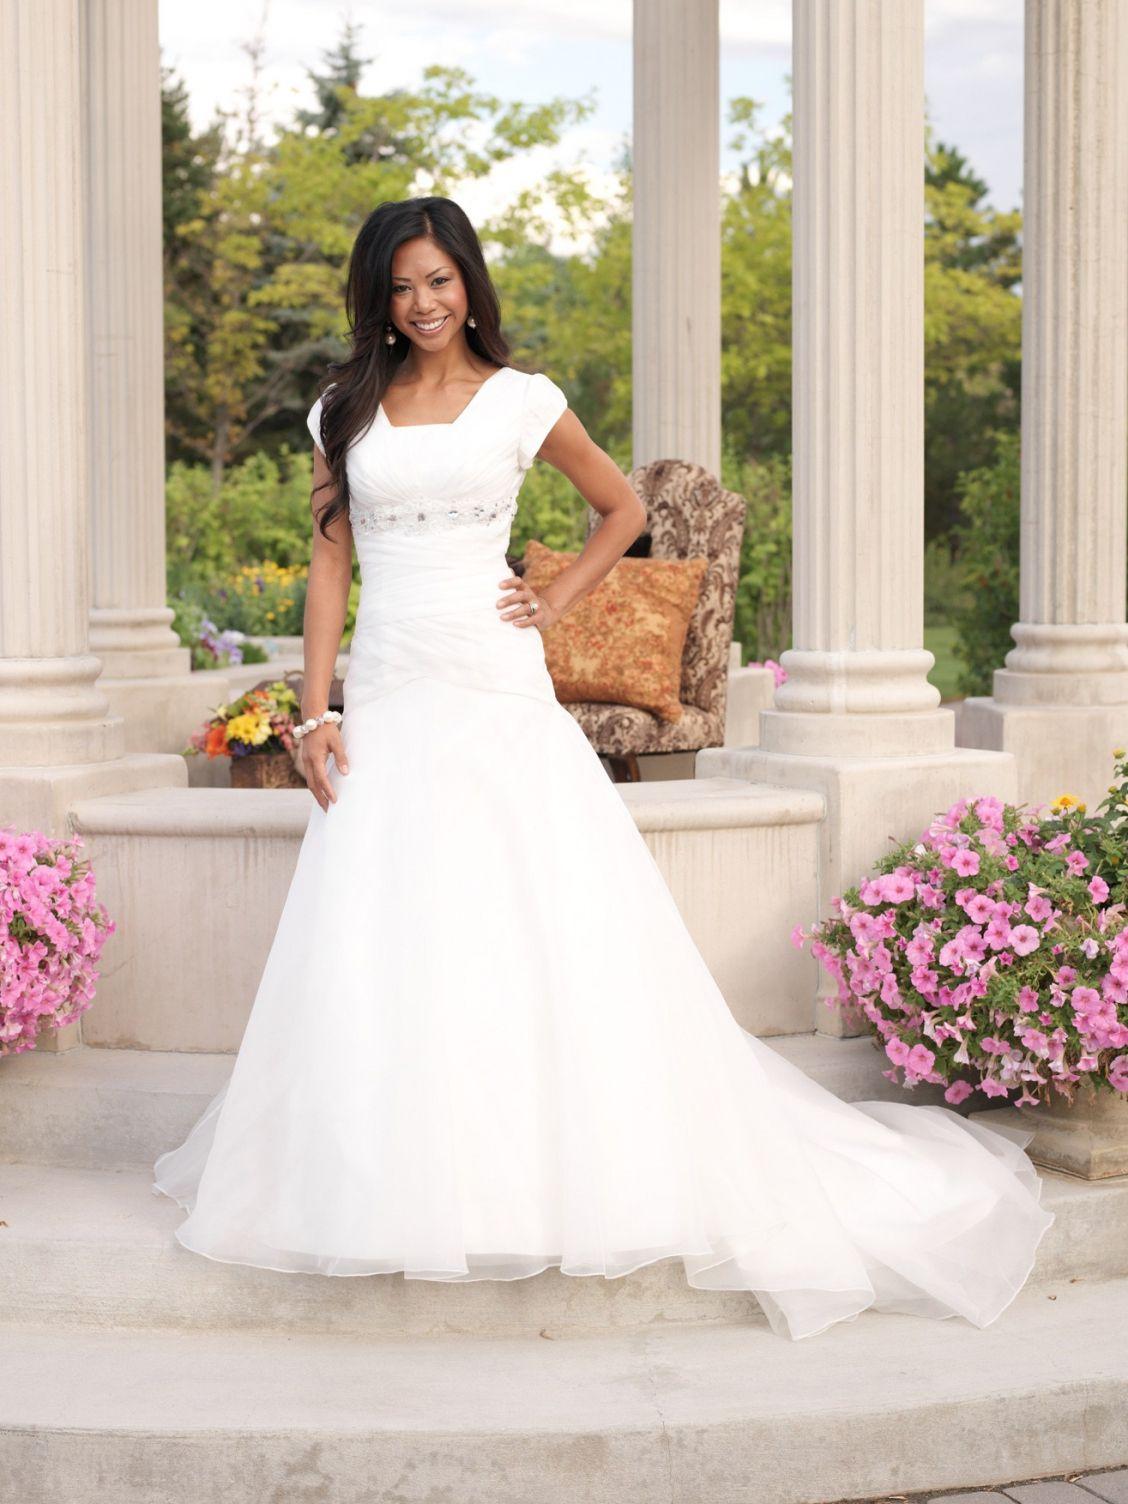 Luxury Wedding Dress Rental Utah Check More At Http Svesty Com Wedding Dress Rental Utah Modest Bridal Dresses Modest Bridal Gowns Modest Wedding Dresses